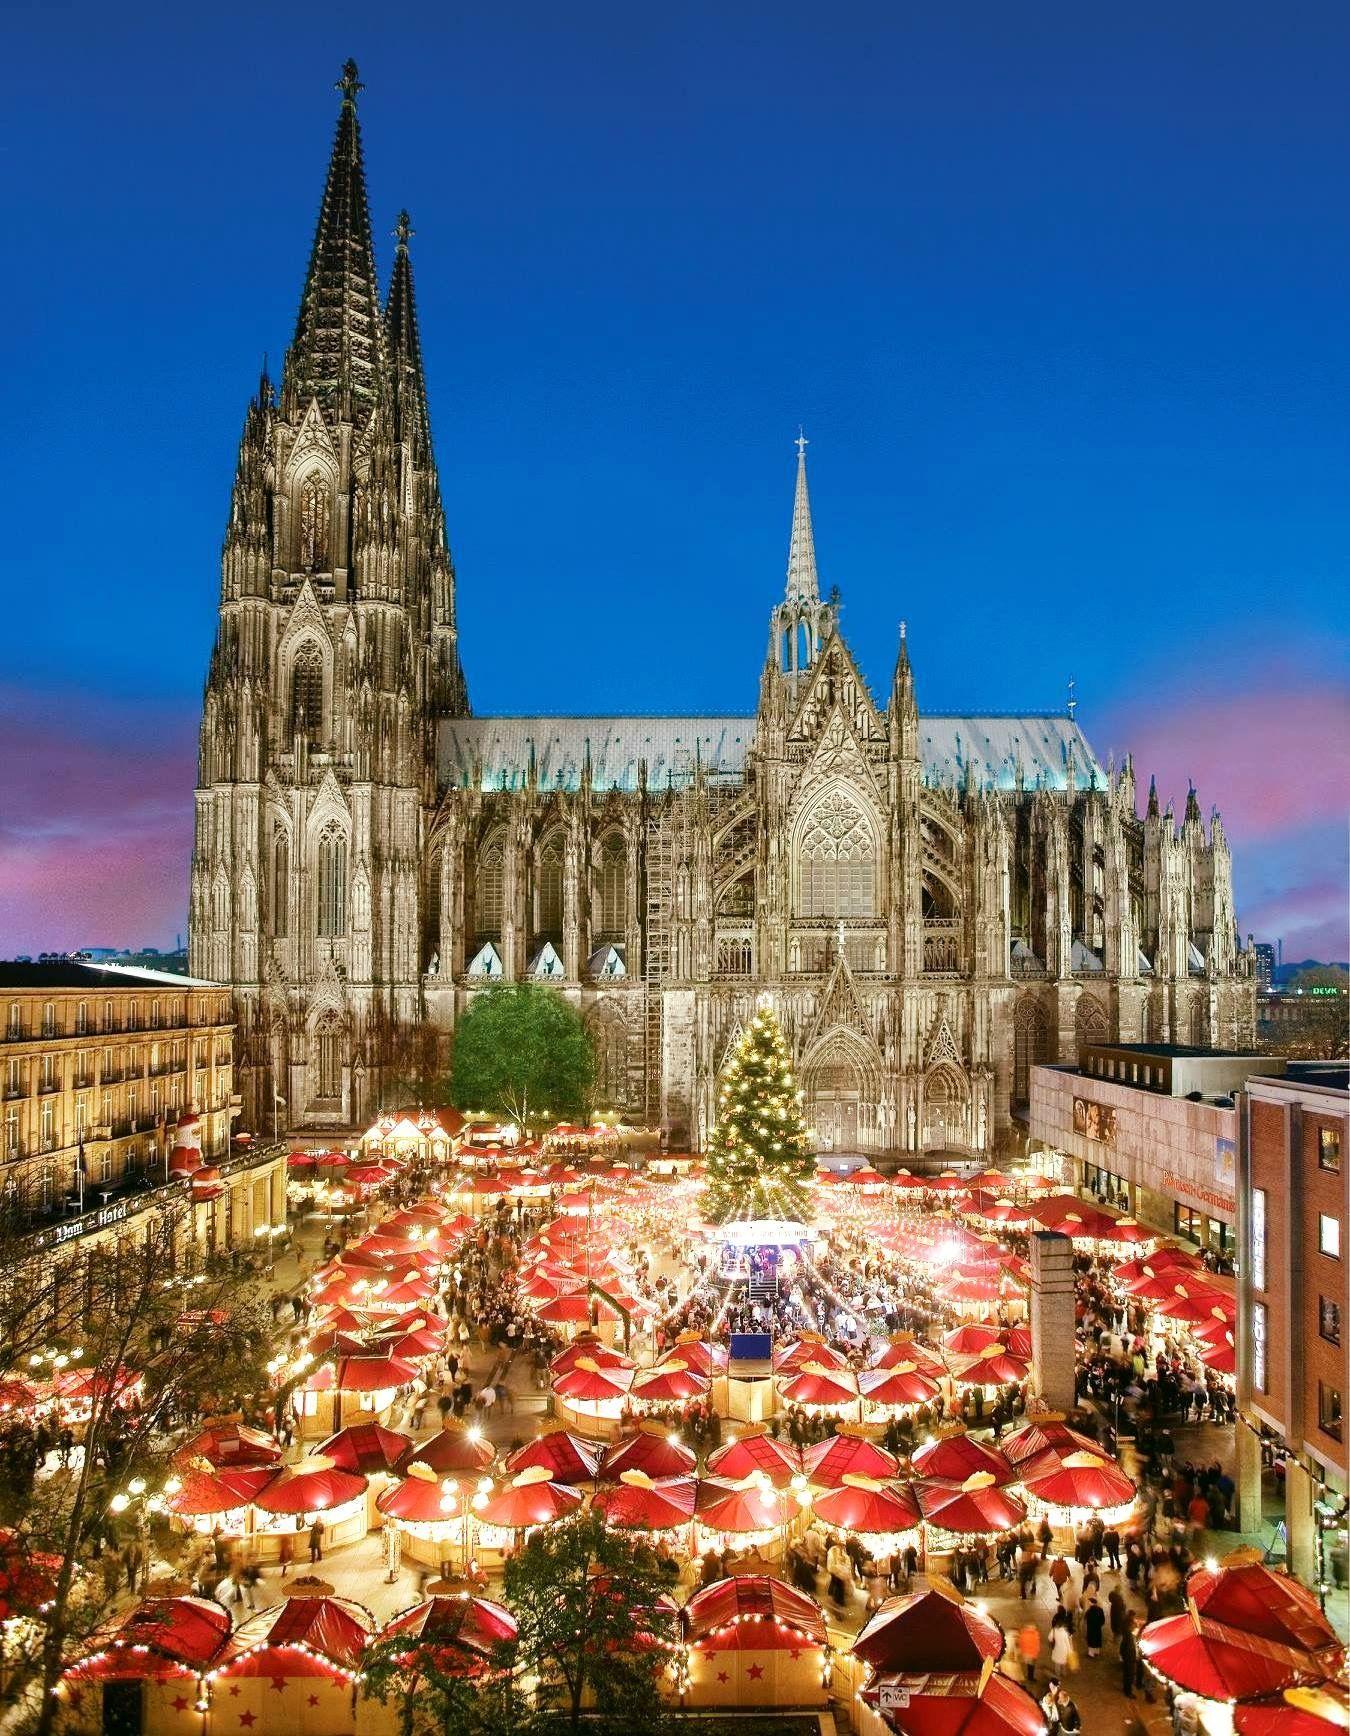 Cologne, Germany 🇩🇪Christmas Market Christmas markets